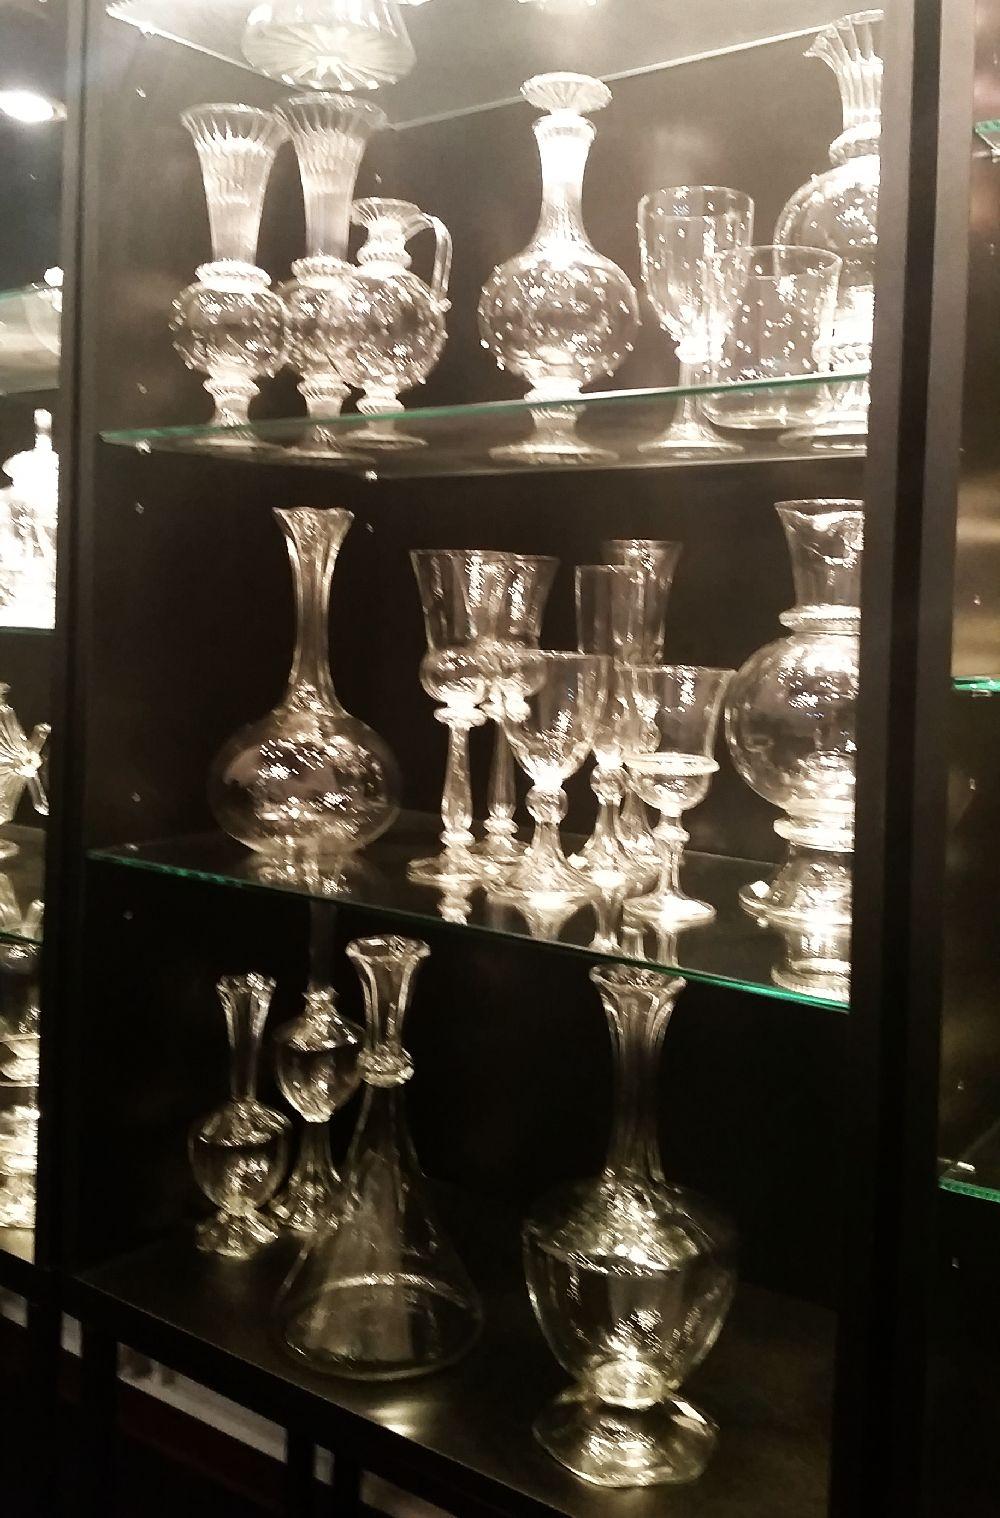 adelaparvu.com despre atelierul de sticlarie Gabriela Seres (12)